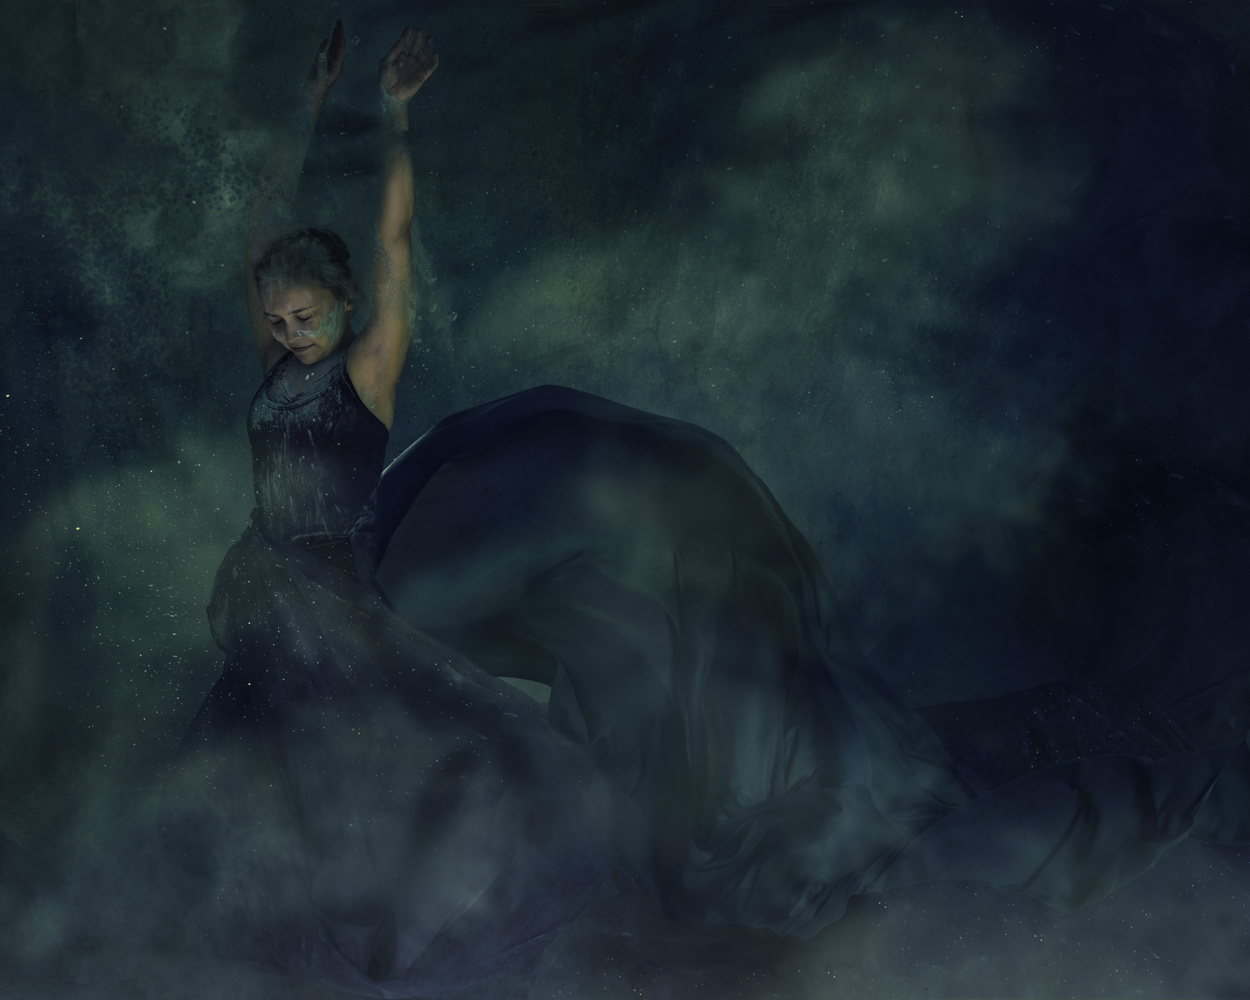 Arielle by Michelle Goodall